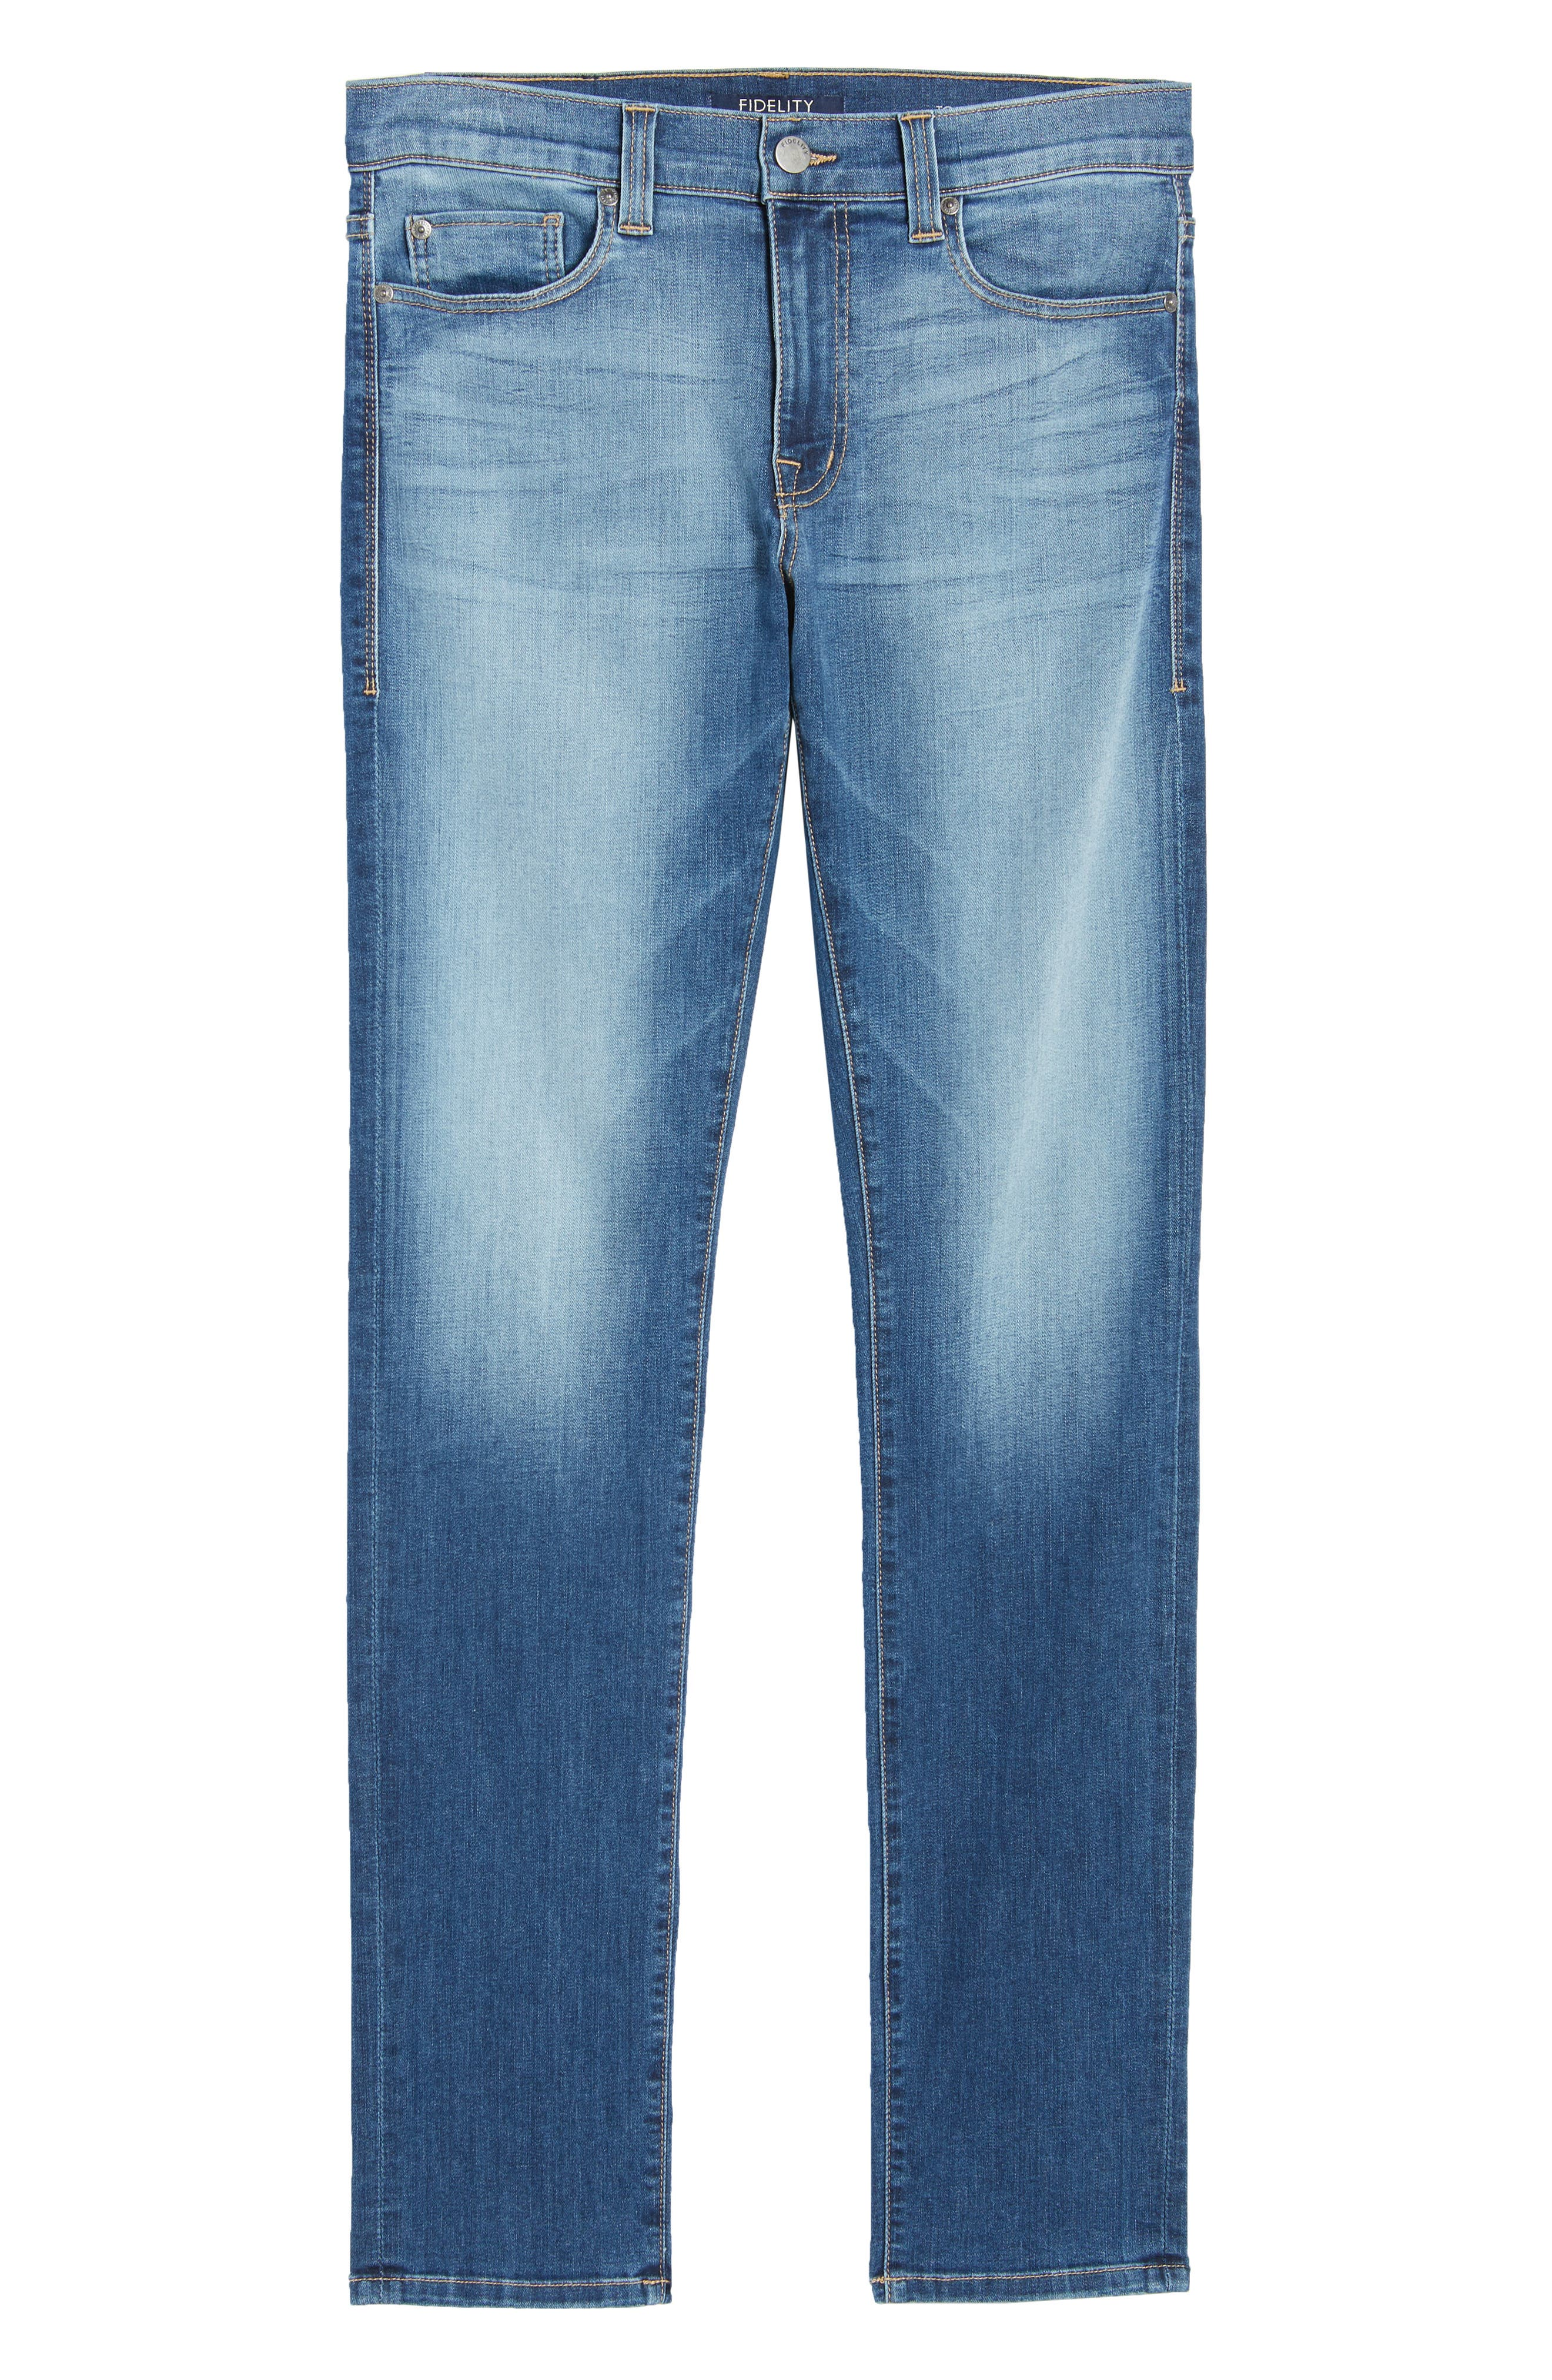 Torino Slim Fit Jeans,                             Alternate thumbnail 6, color,                             Elysium Blue